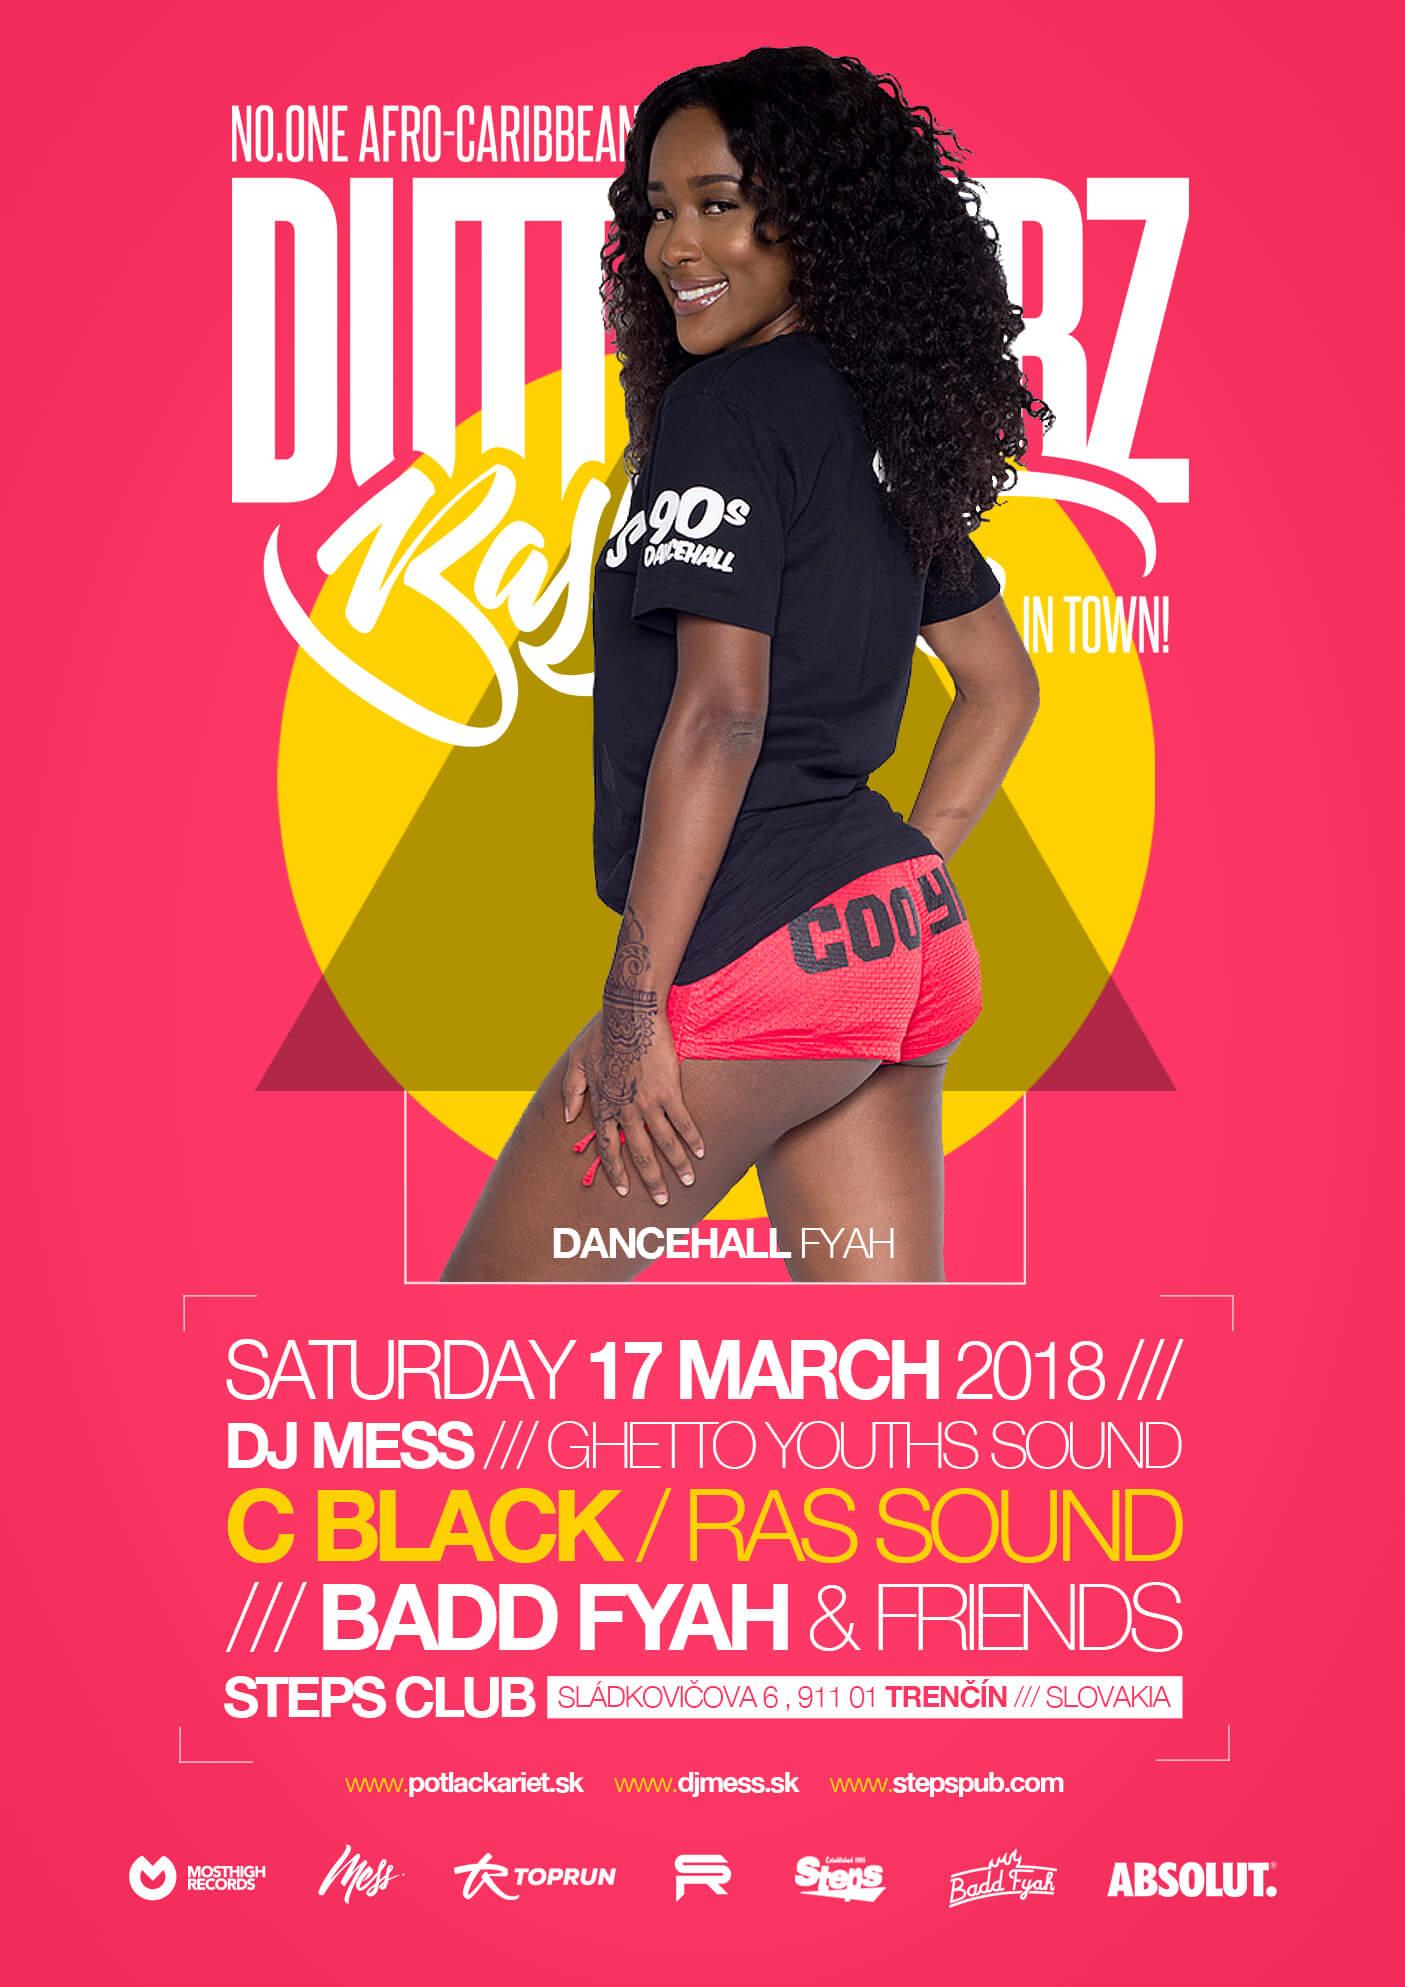 17 03 2018 DUTTY VYBZ BASHMENT   DANCEHALL FYAH - DJ MESS